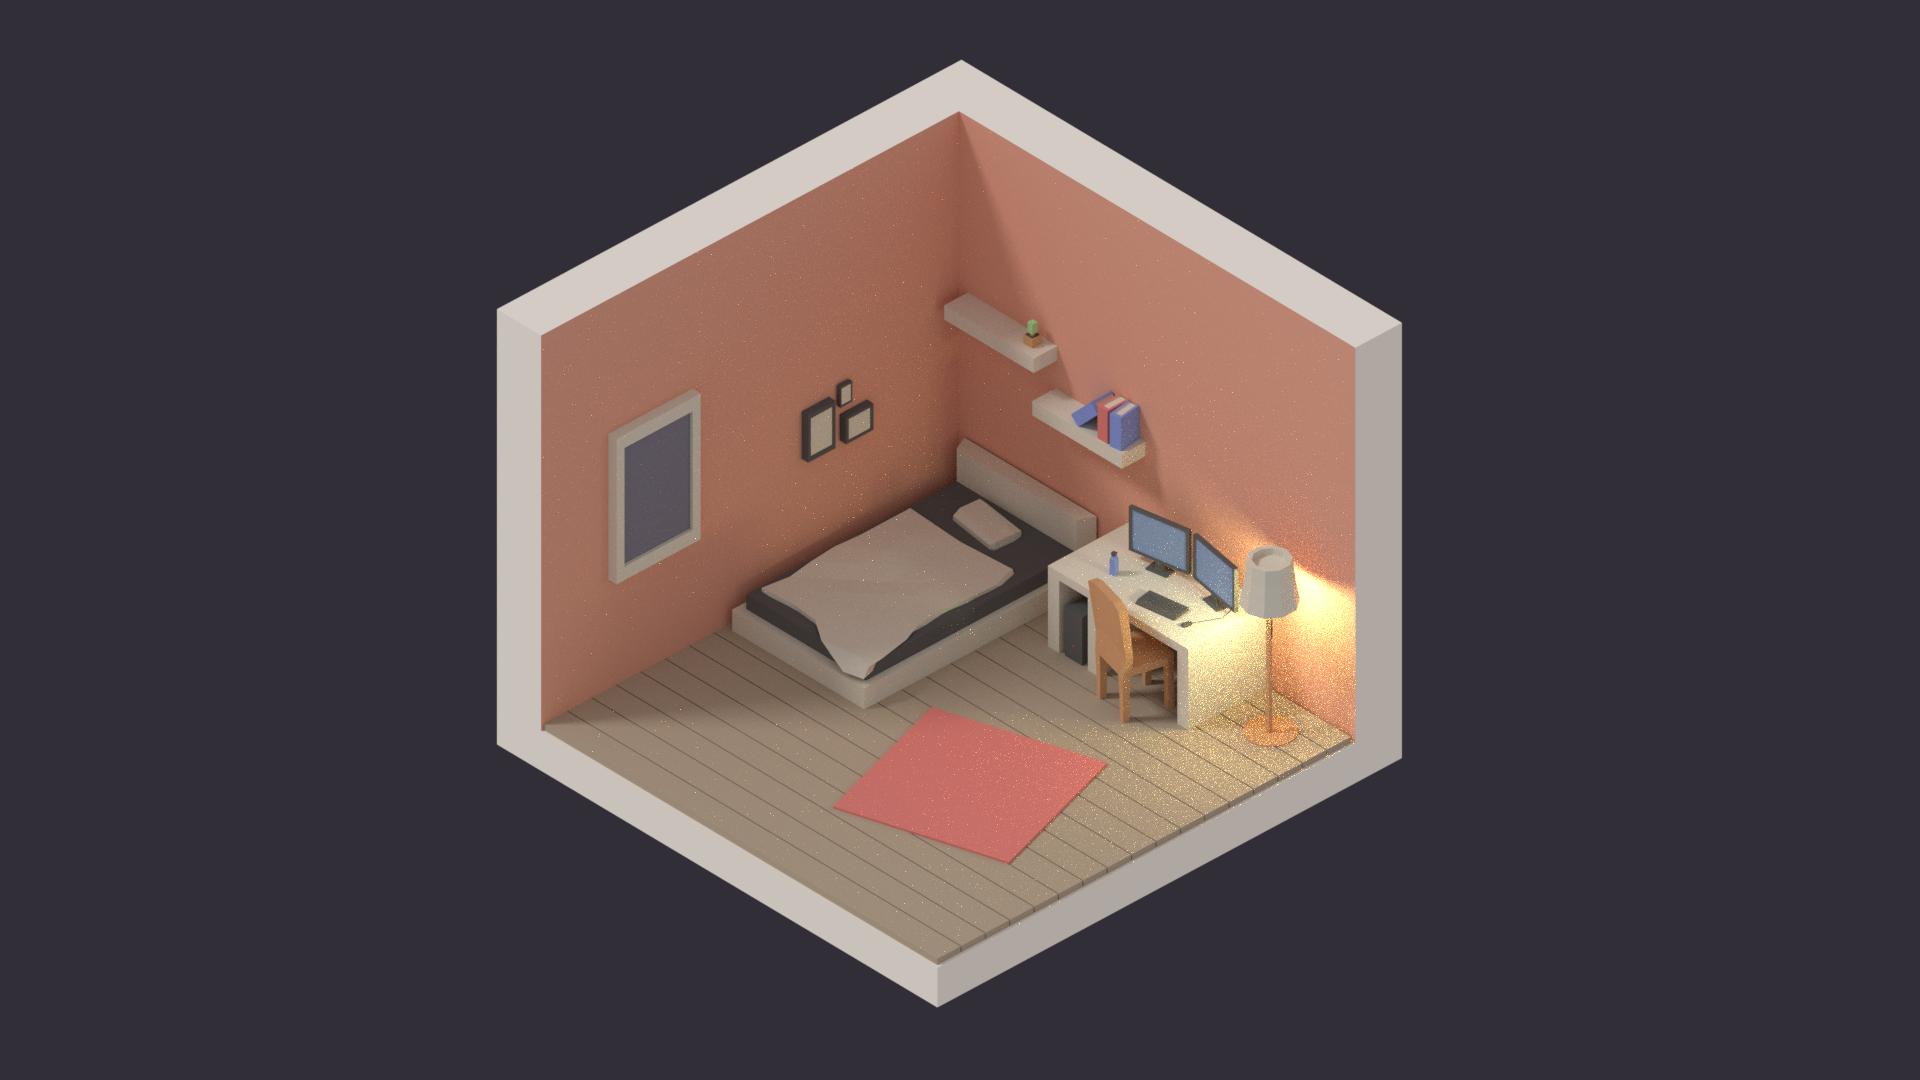 Create Isometric Rooms And Furniture In Blender Part 1 3 Blendernation